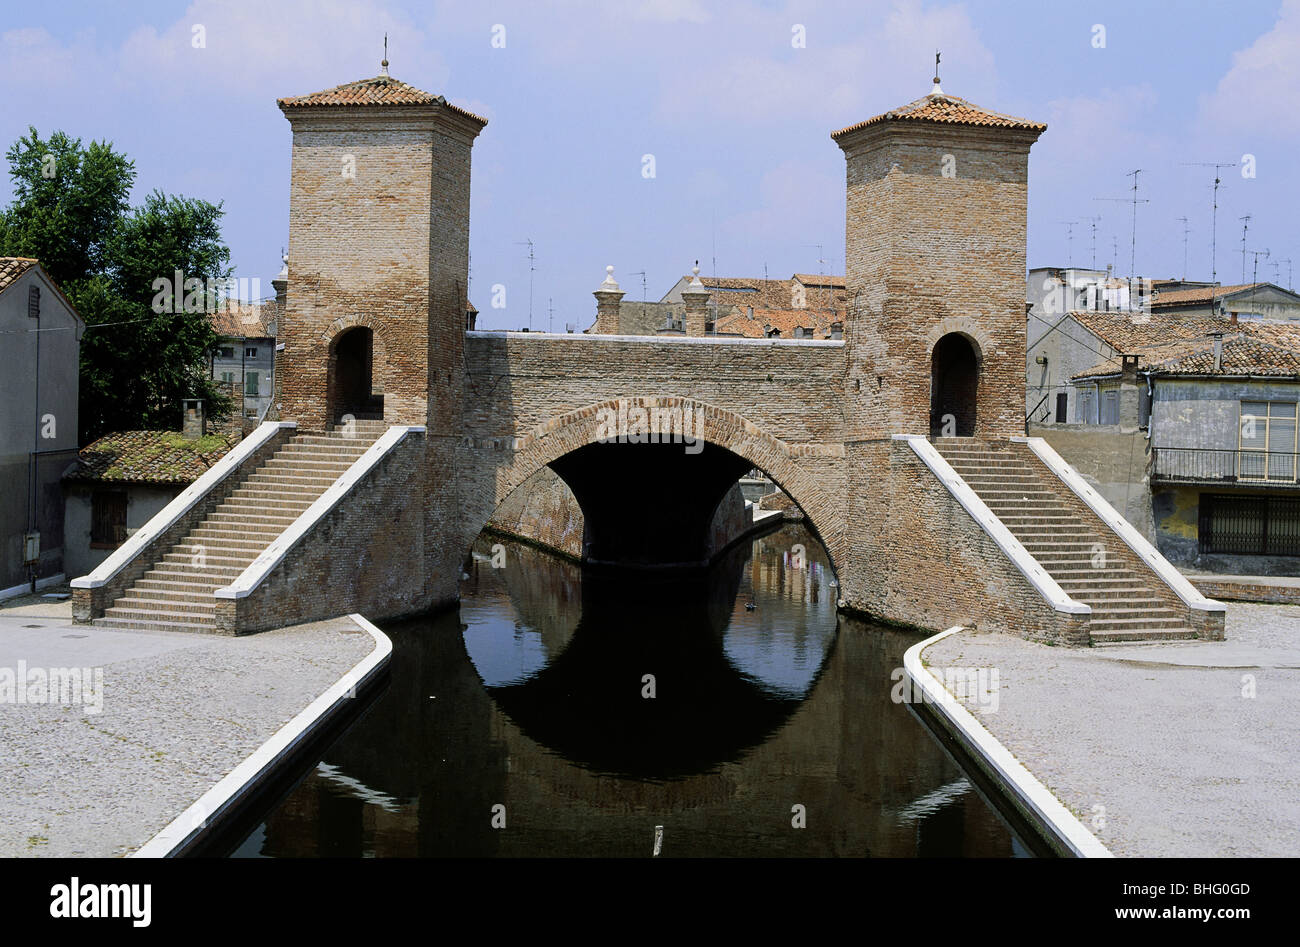 geography / travel, Italy, Ravenna, bridges, Comacchio, bridges, Treponti bridge, Additional-Rights-Clearance-Info Stock Photo